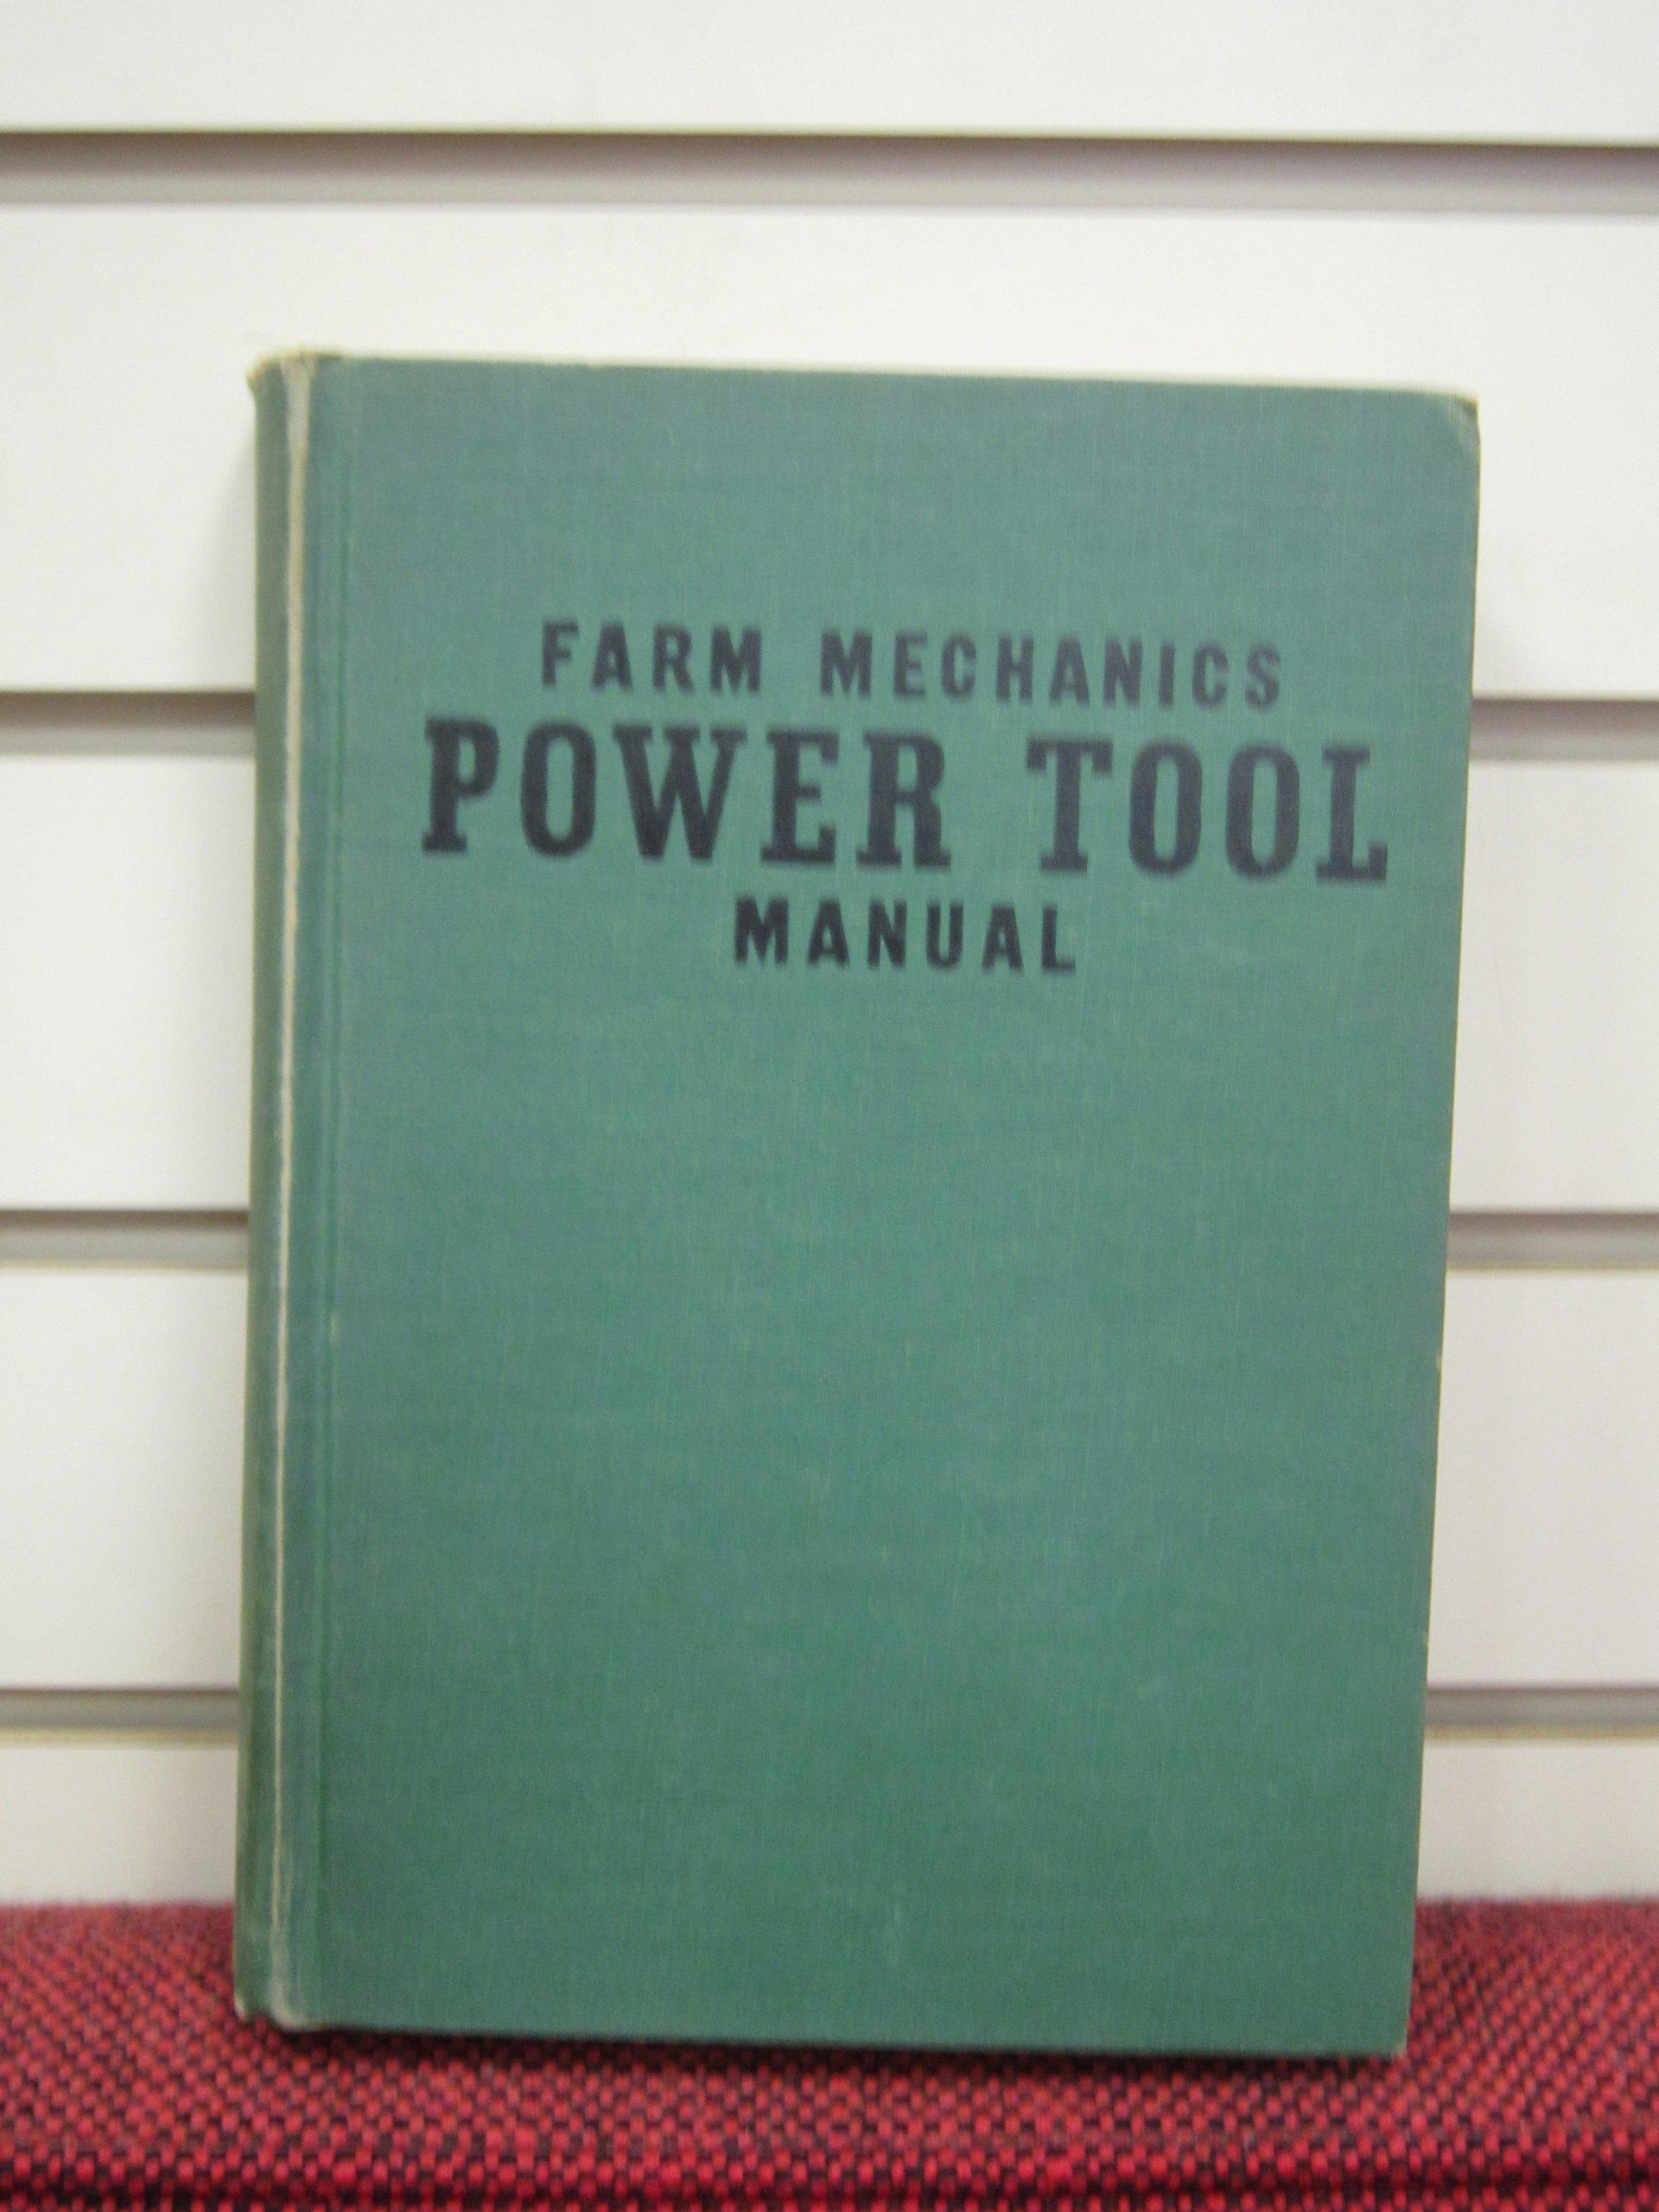 Farm Mechanics Power Tool Manual: Floyd Mix: 9781114630604: Amazon.com:  Books